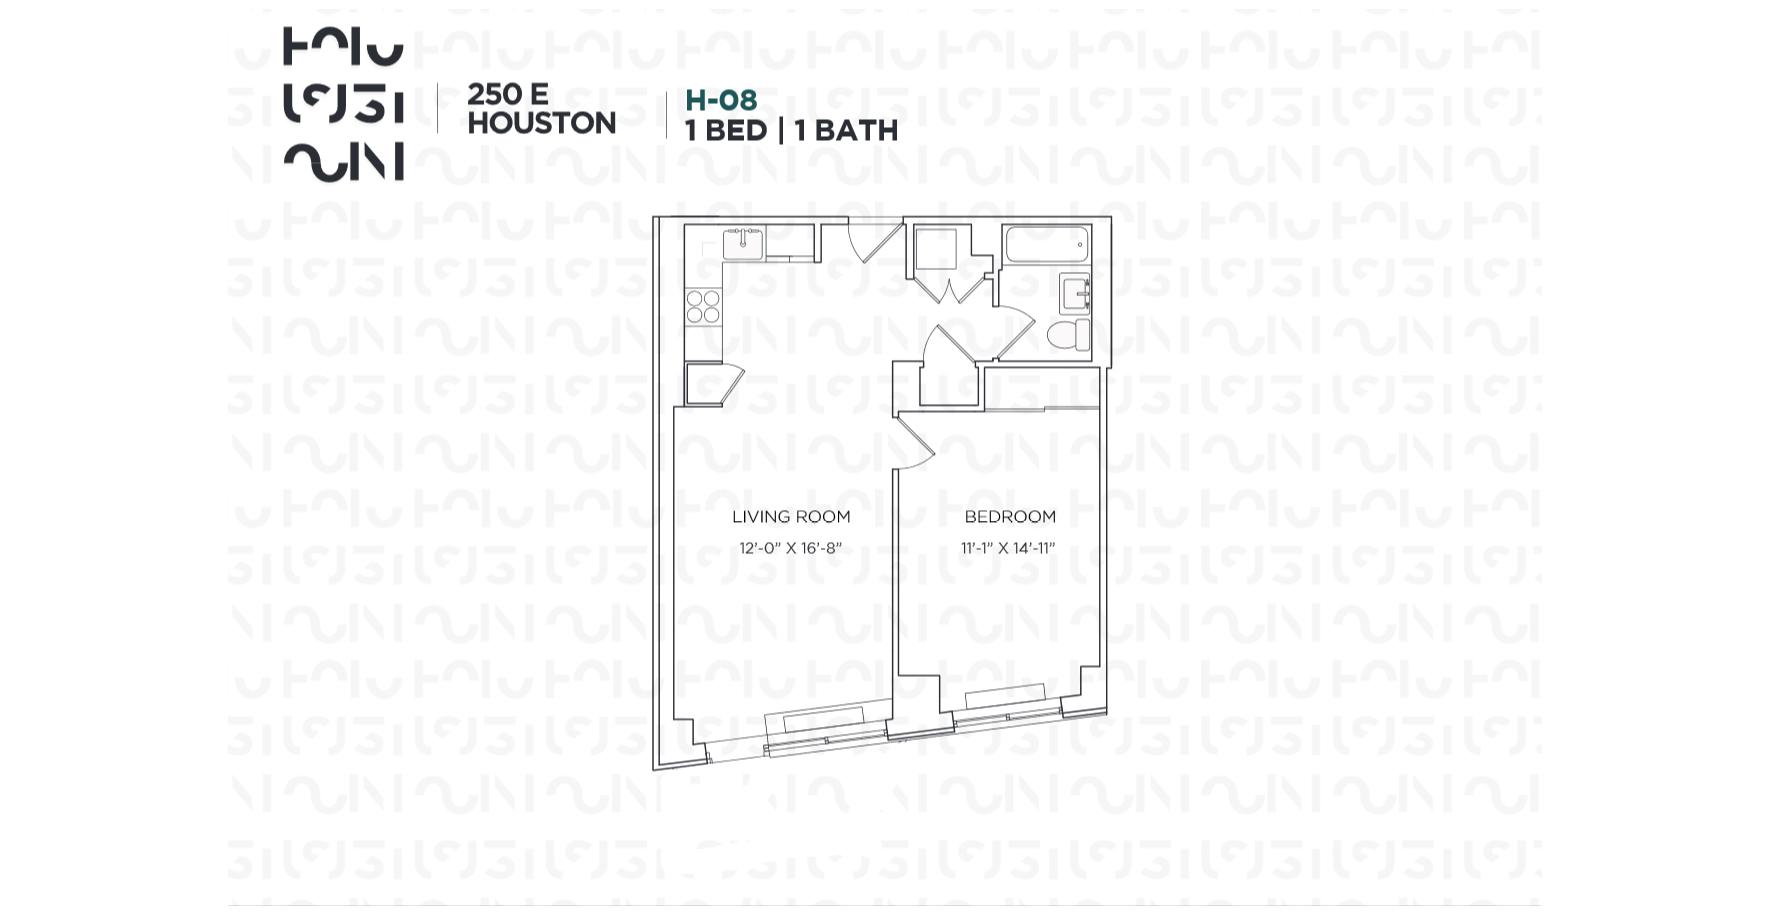 Floor plan for 2H